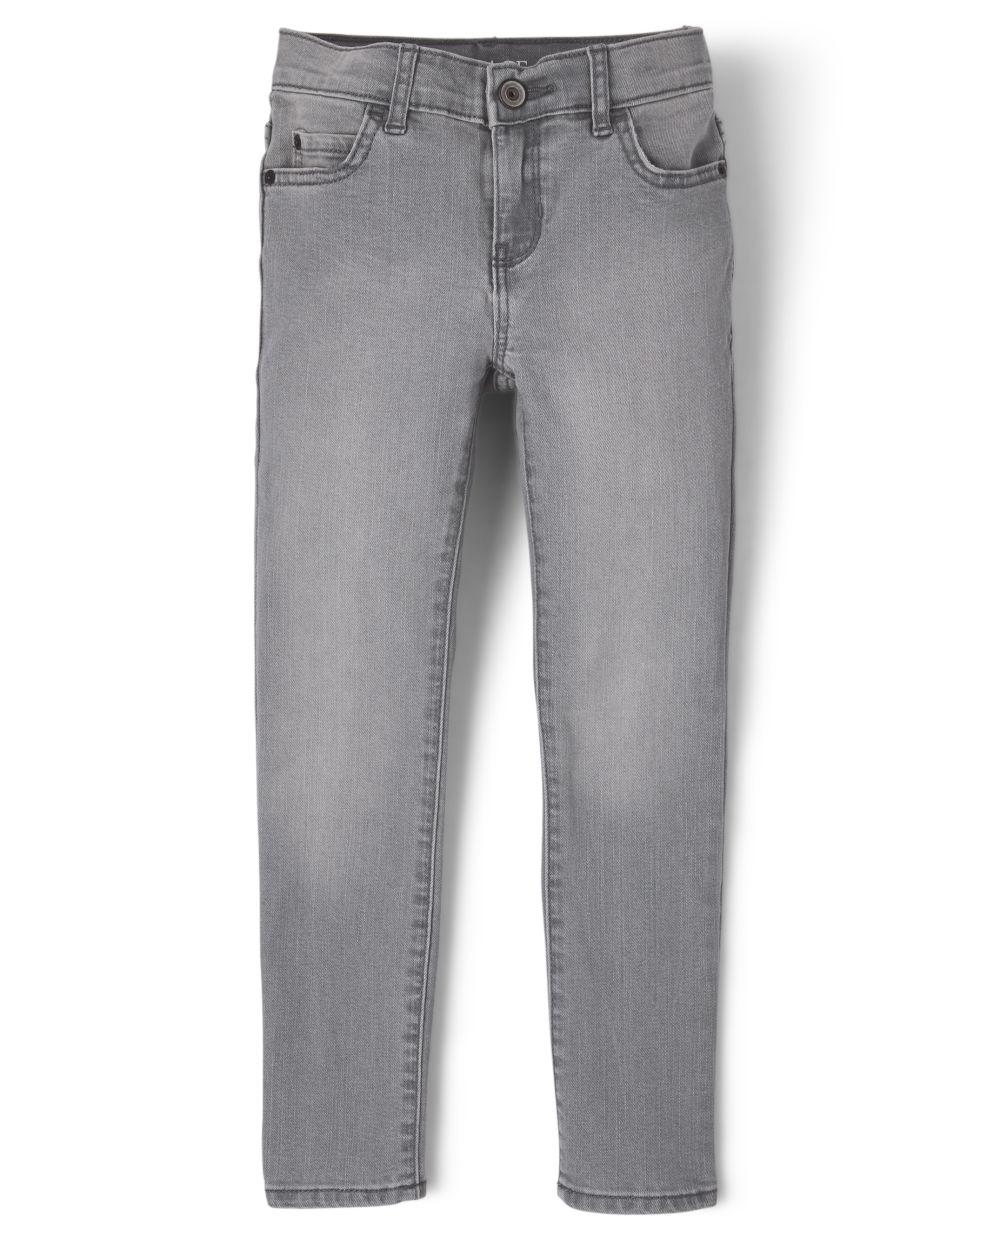 s Boys Basic Stretch Skinny Jeans - Denim - The Children's Place